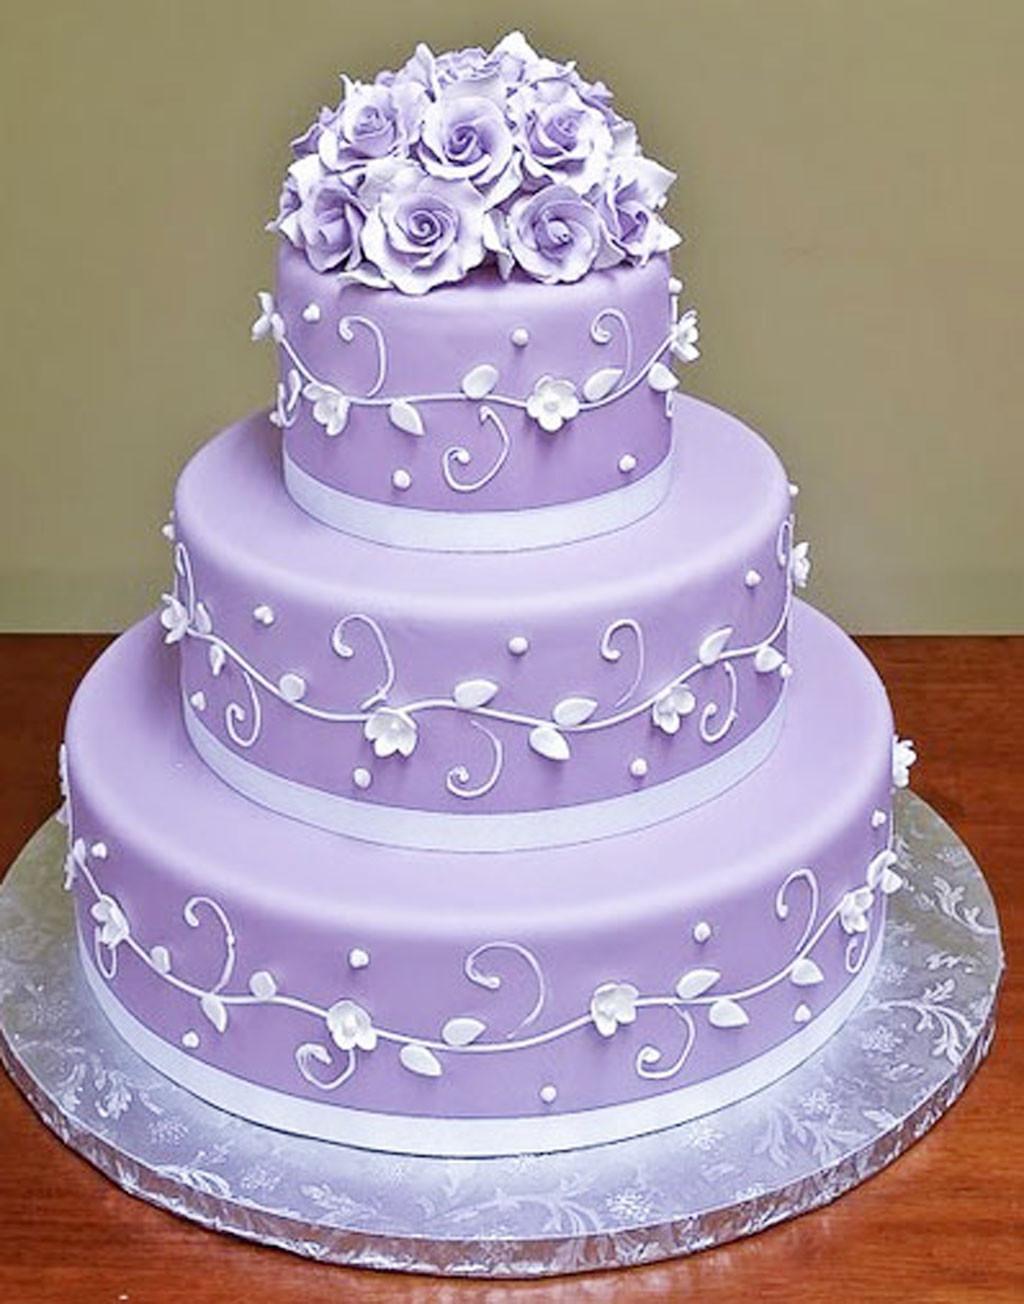 Lavender Wedding Cakes  Lavender Wedding Cakes Wedding Cake Cake Ideas by